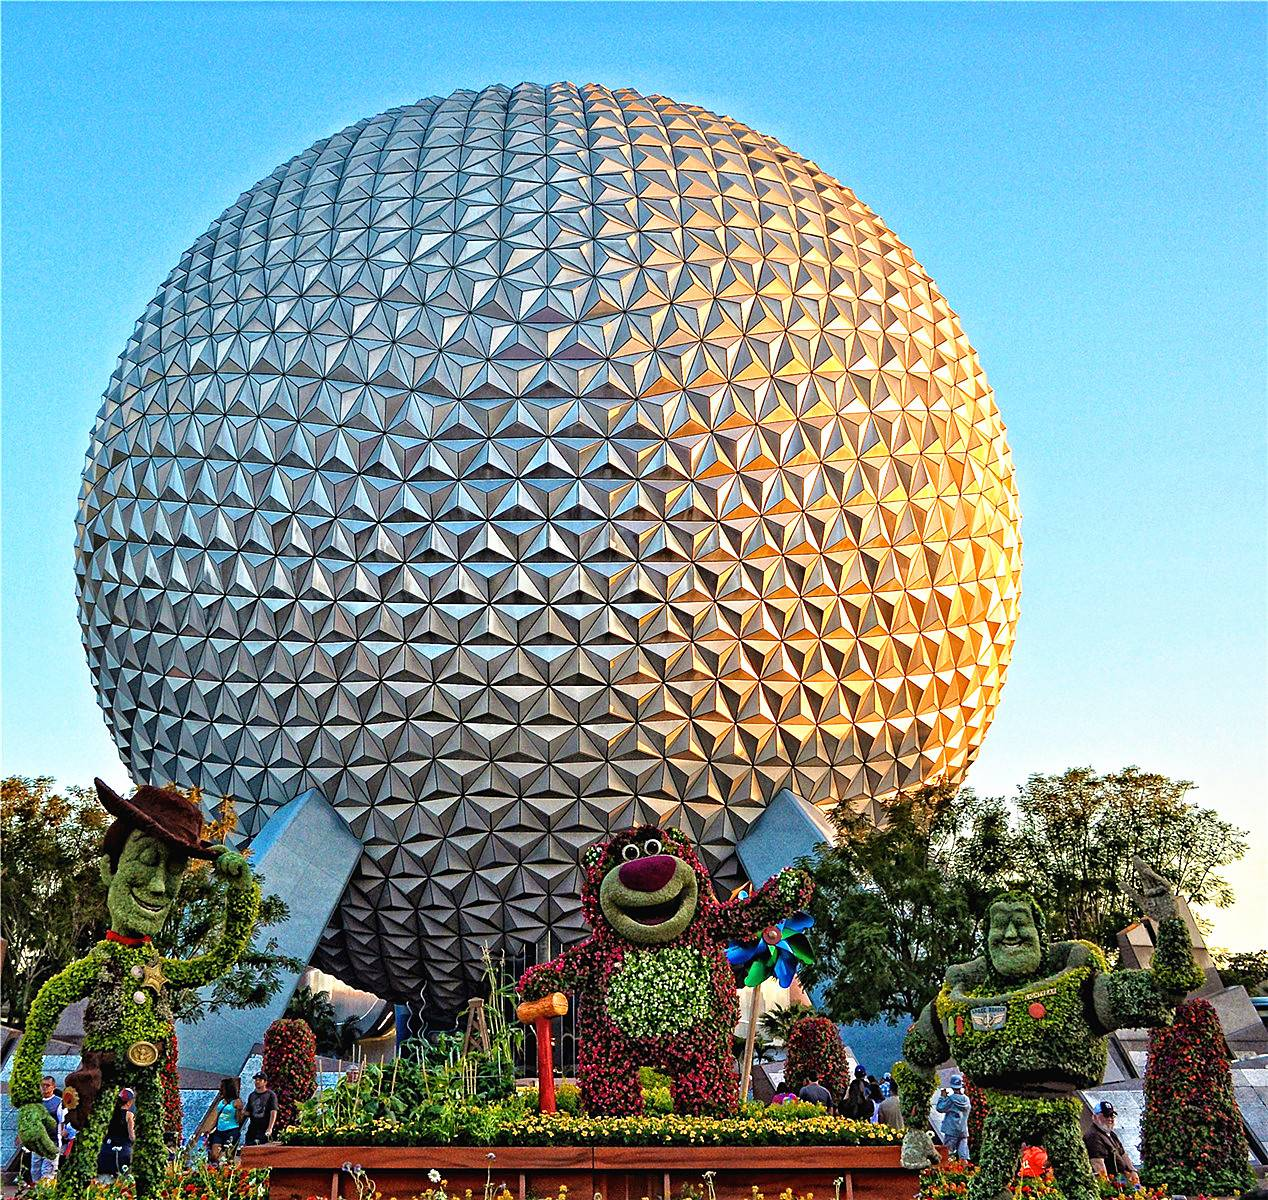 Cheap Universal Studios Orlando Vacation Packages: 7-Day Orlando Vacation Package Tour To Epcot Center